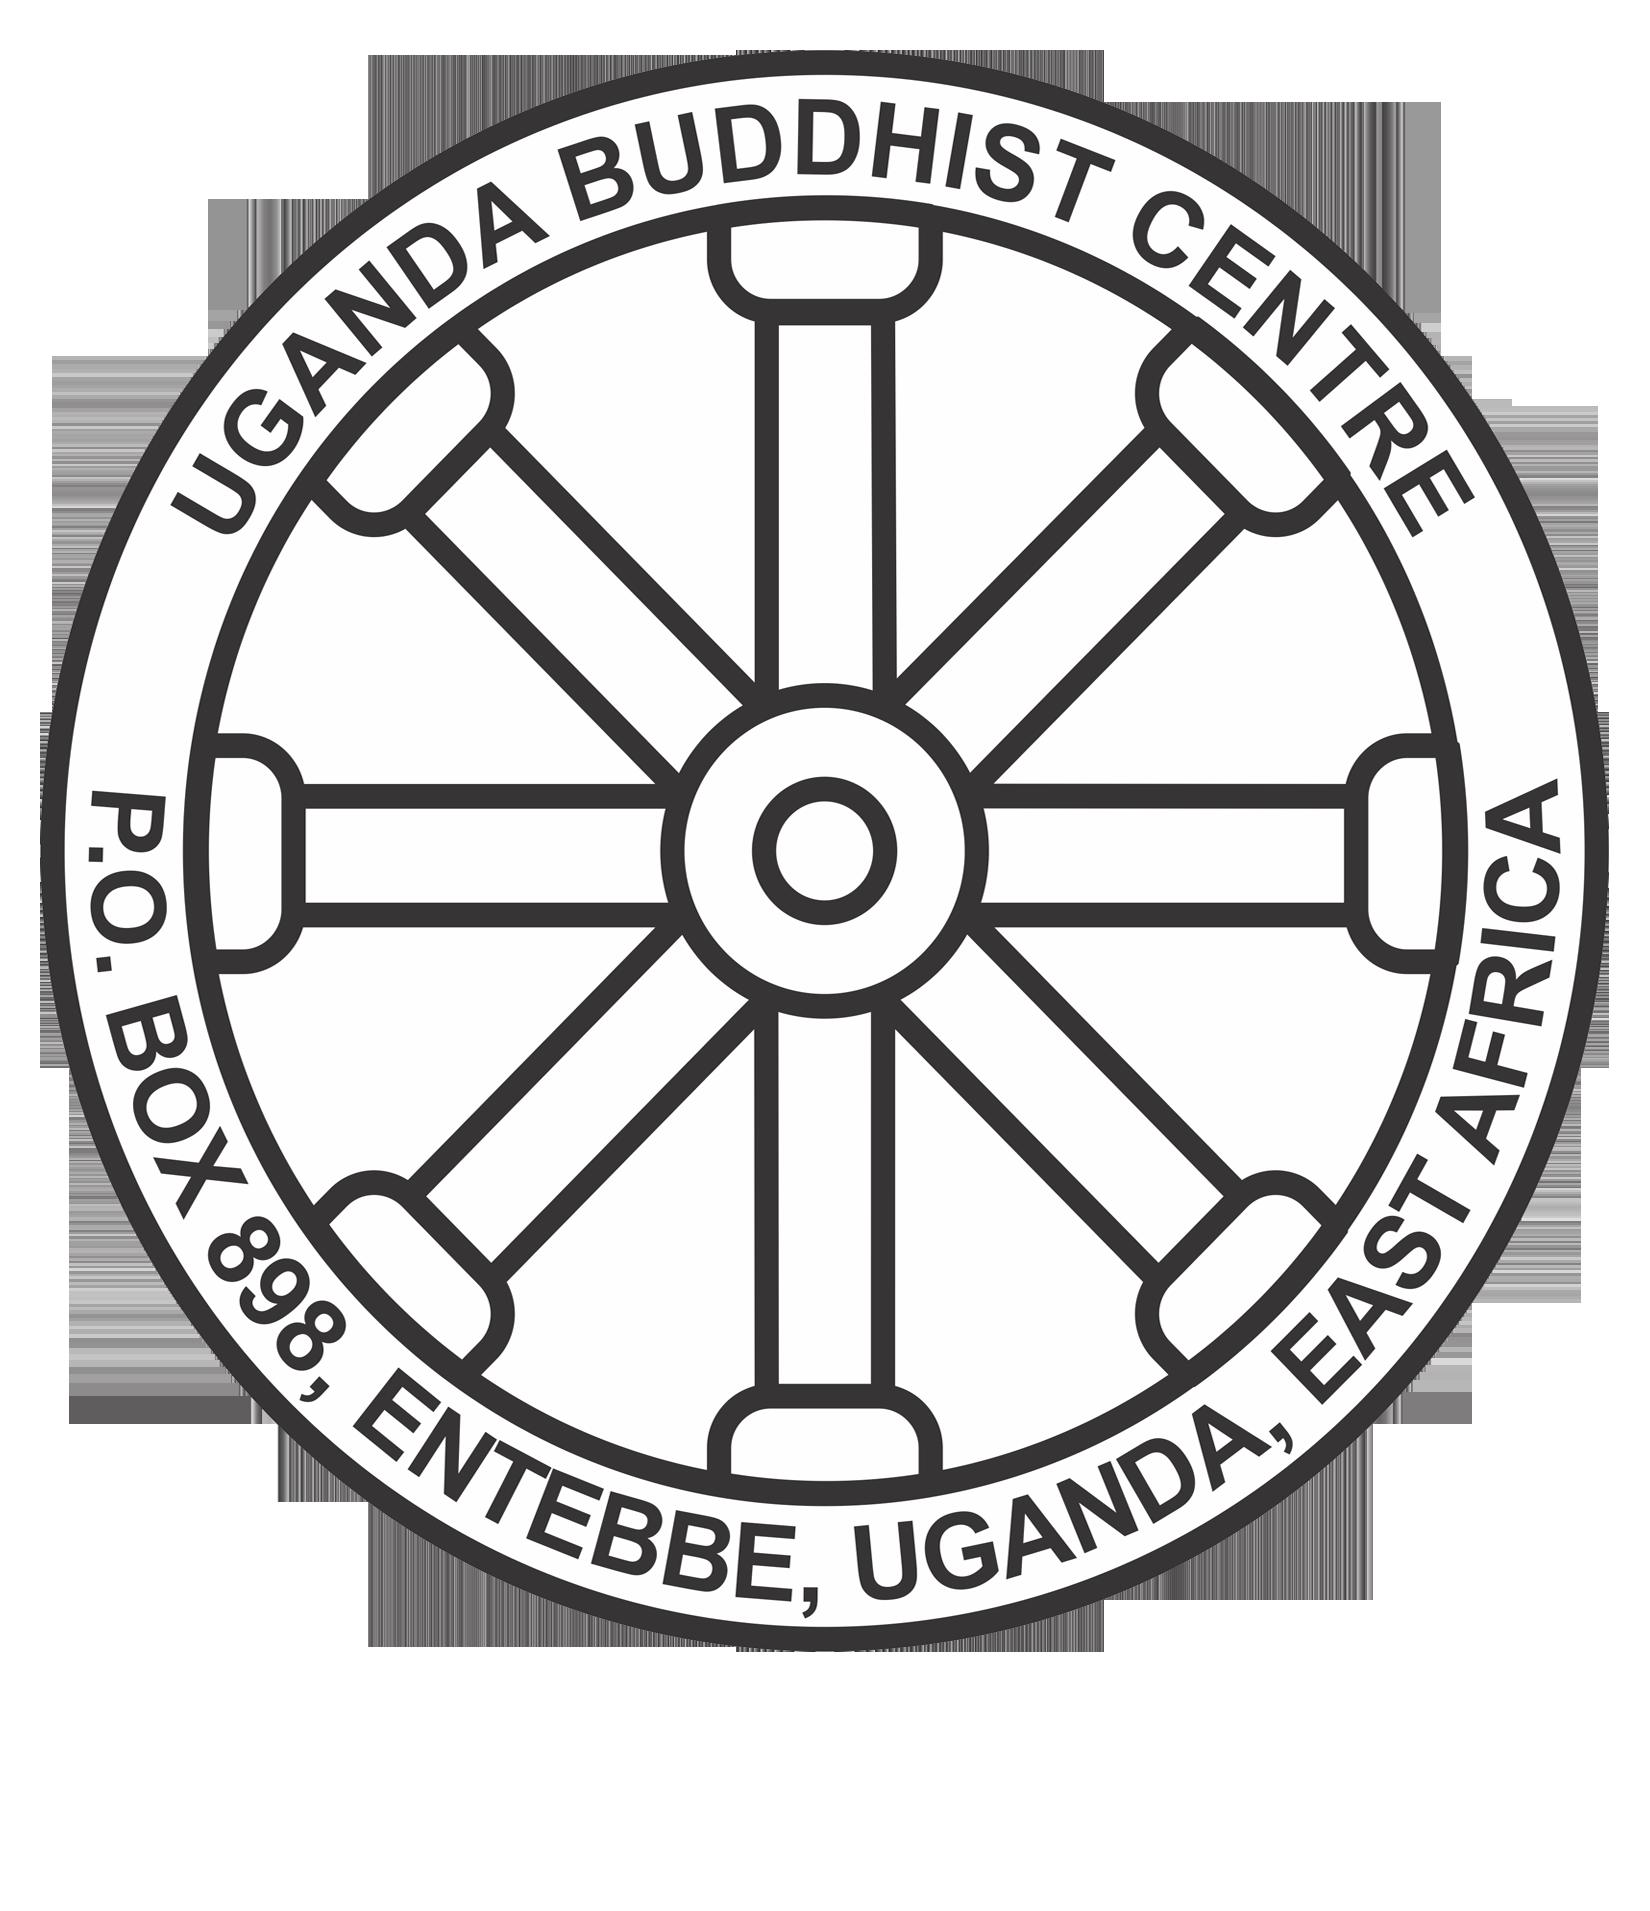 Uganda Buddhist Centre